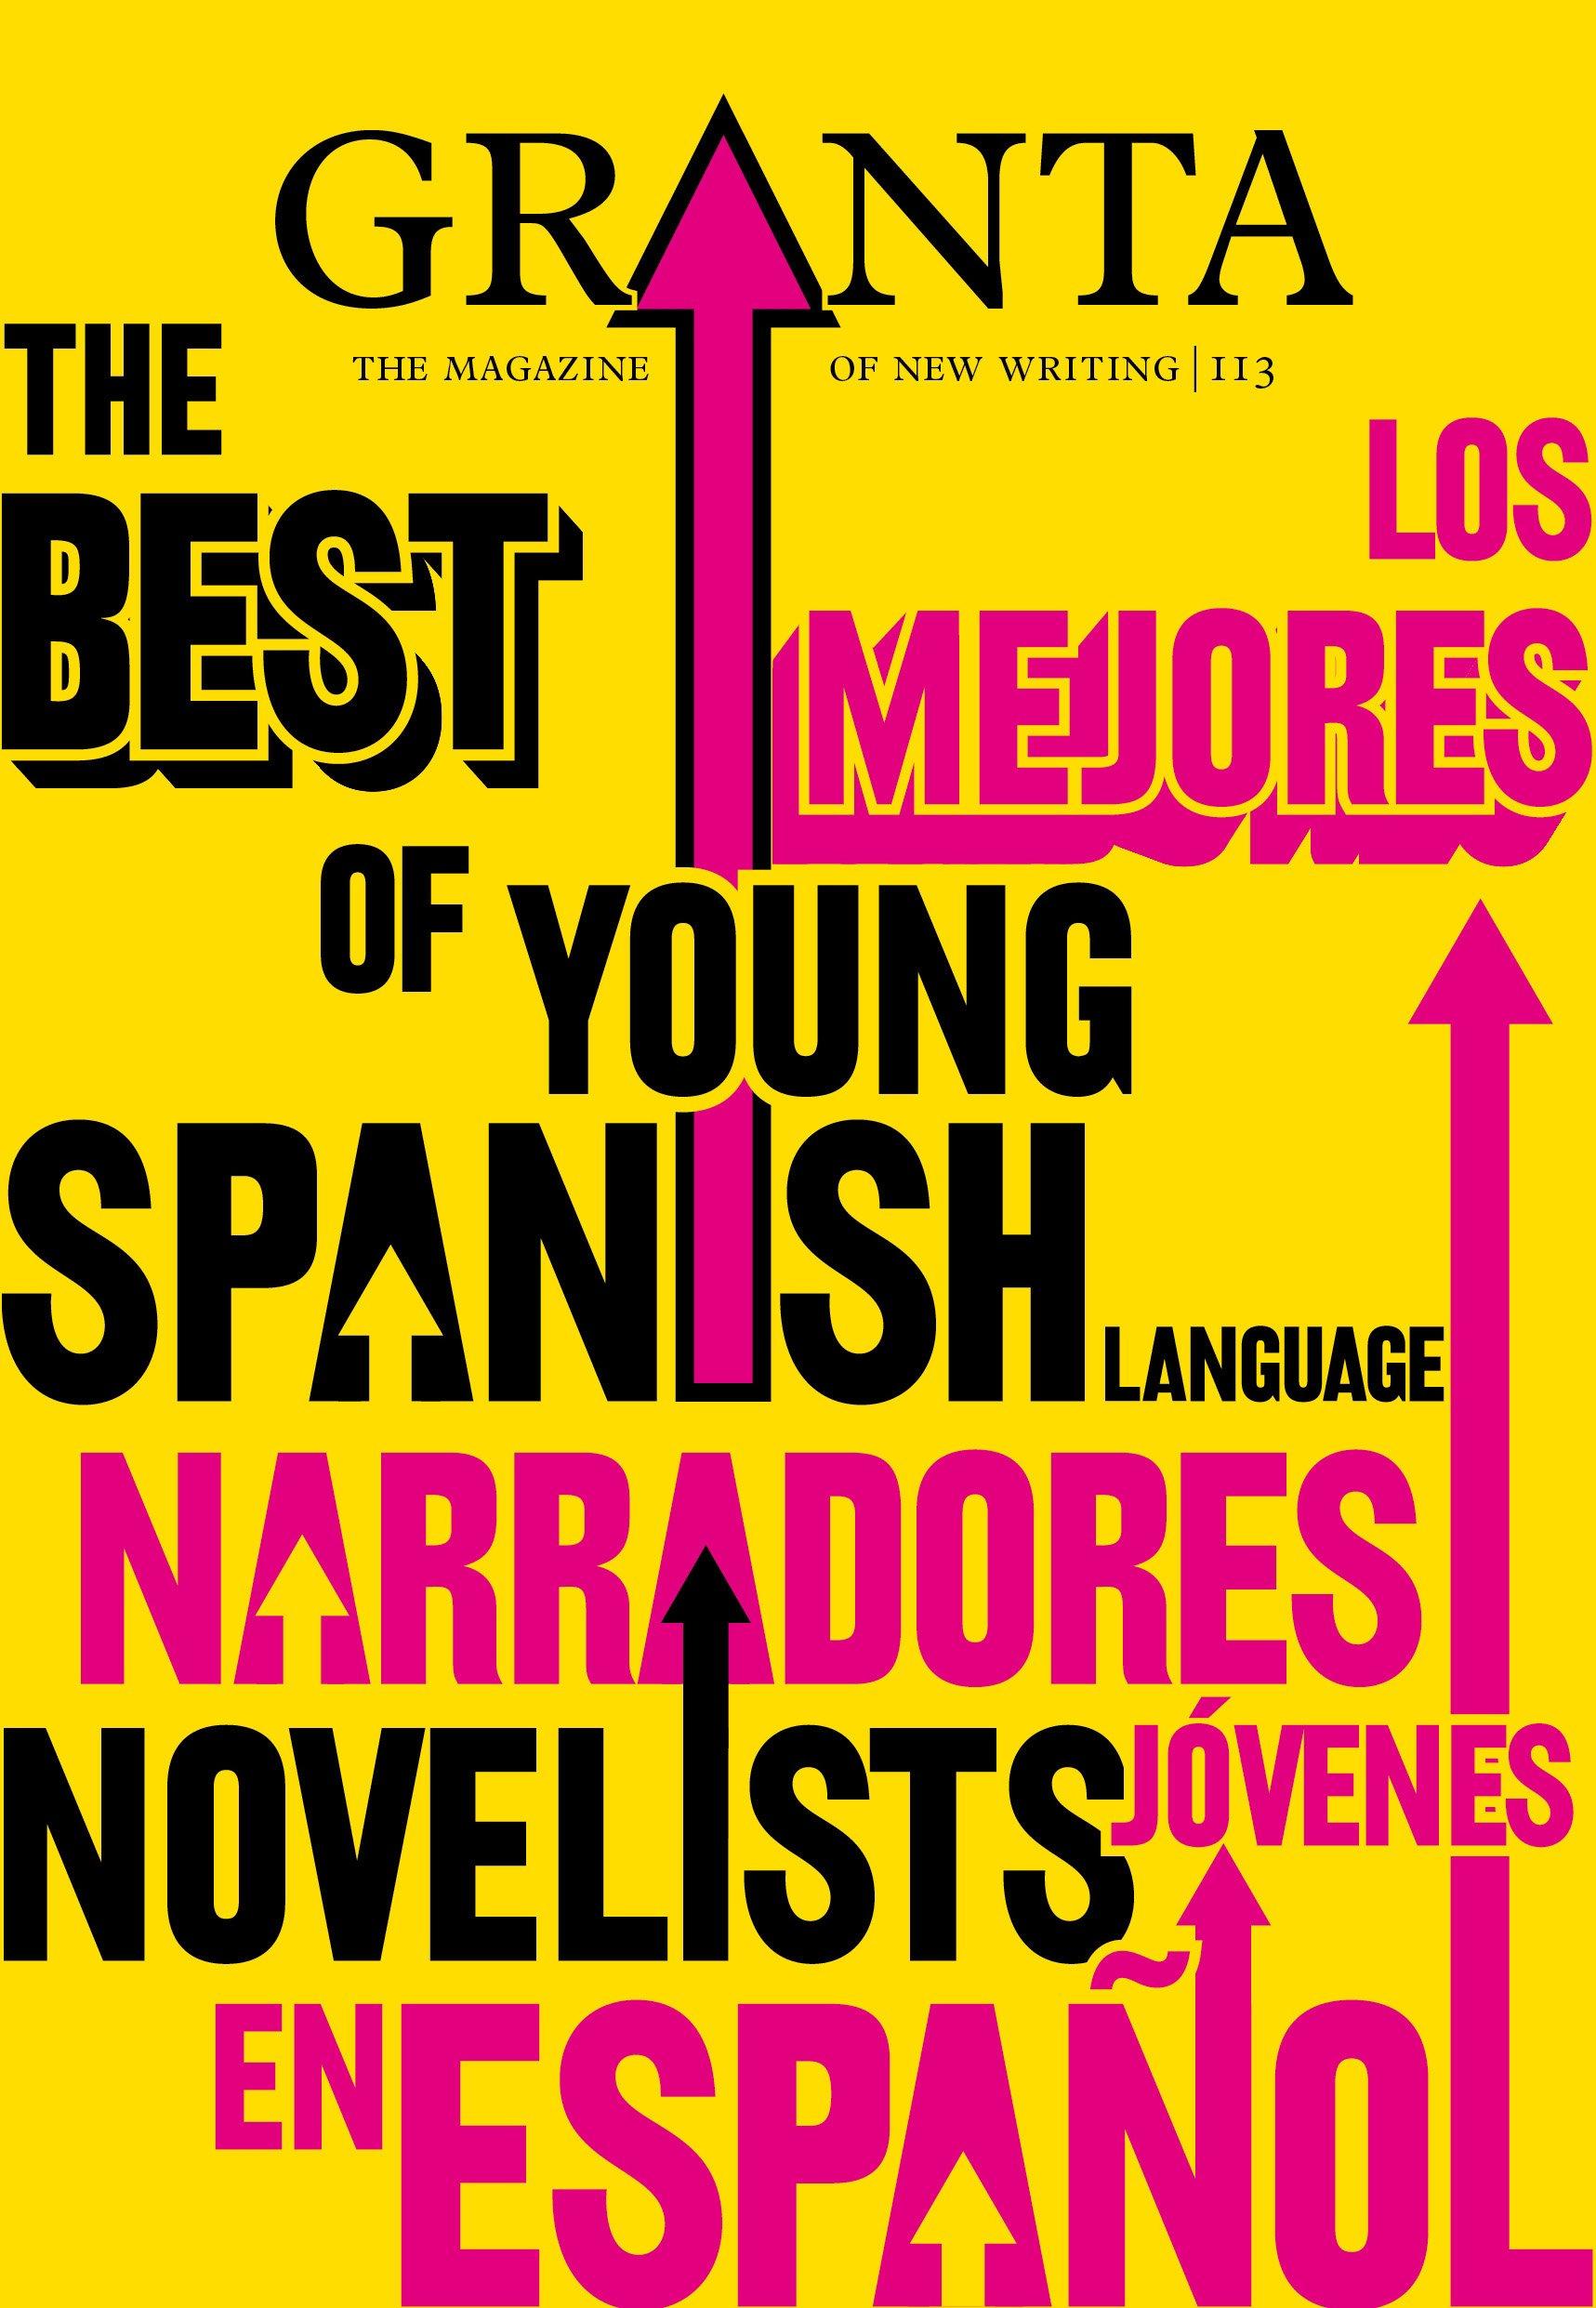 Granta 113: The Best of Young Spanish Language Novelists (Los Mejores Narradores Jovenes en Espanol)